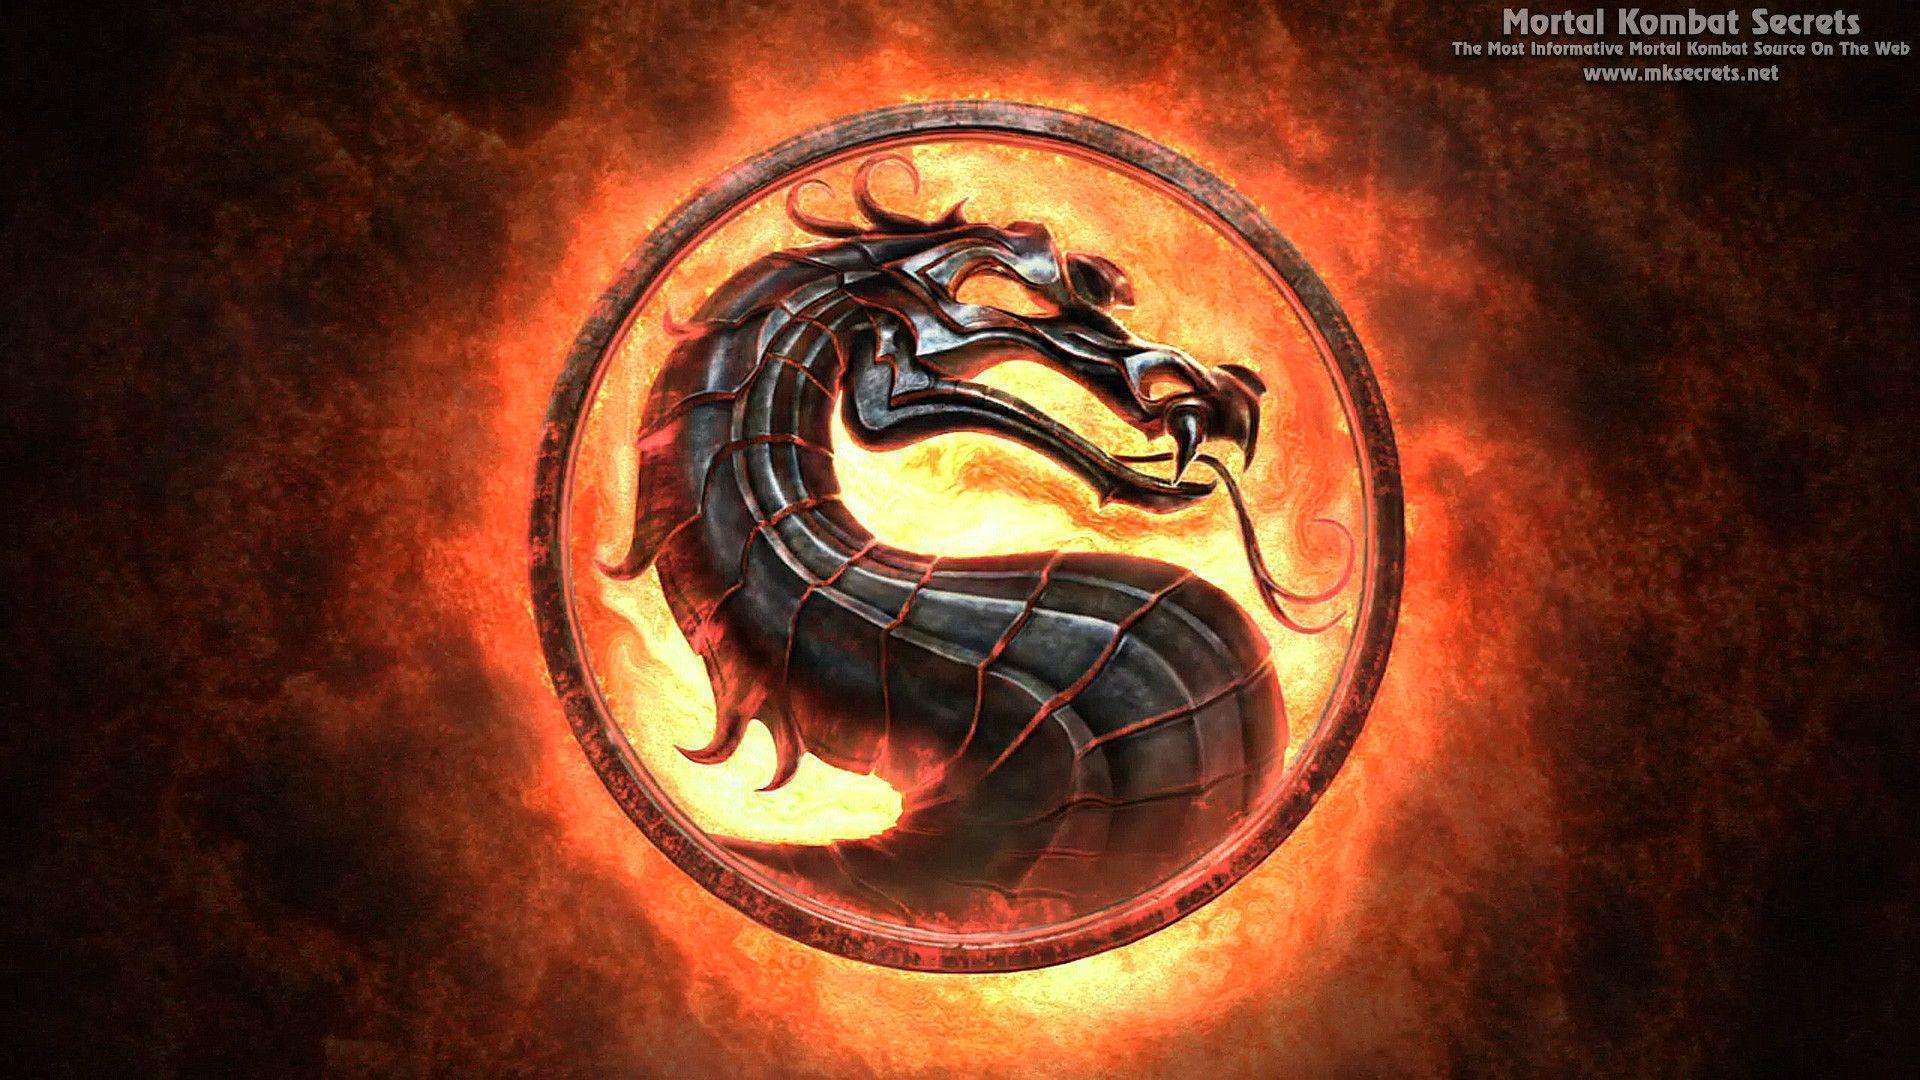 Mortal Kombat HD Wallpapers